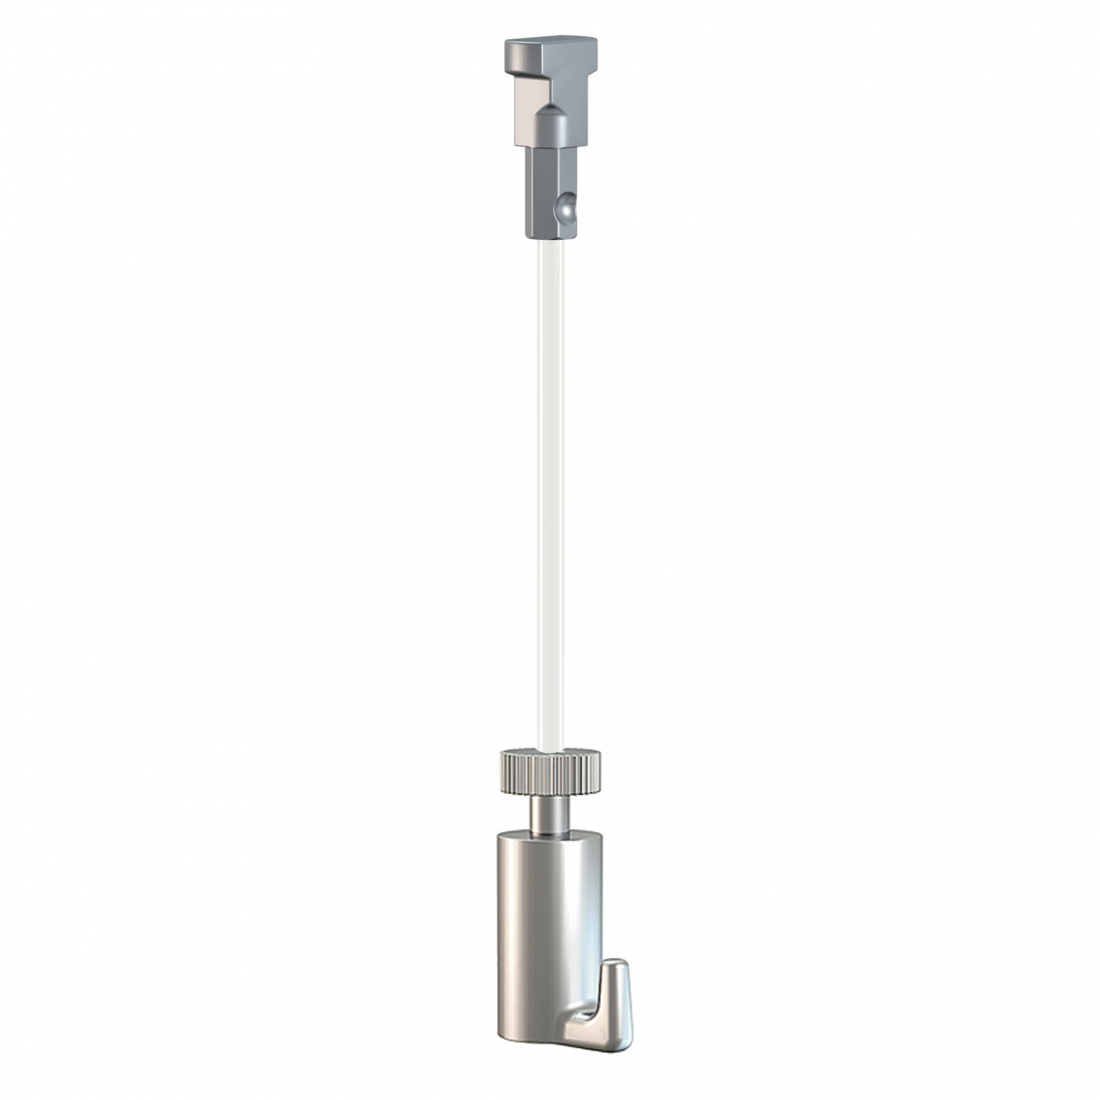 KIT de CABLE de NYLON para guia para colgar cuadros artiteq, modelo TWISTER , con GANCHO para colgar cuadros de 15 KG